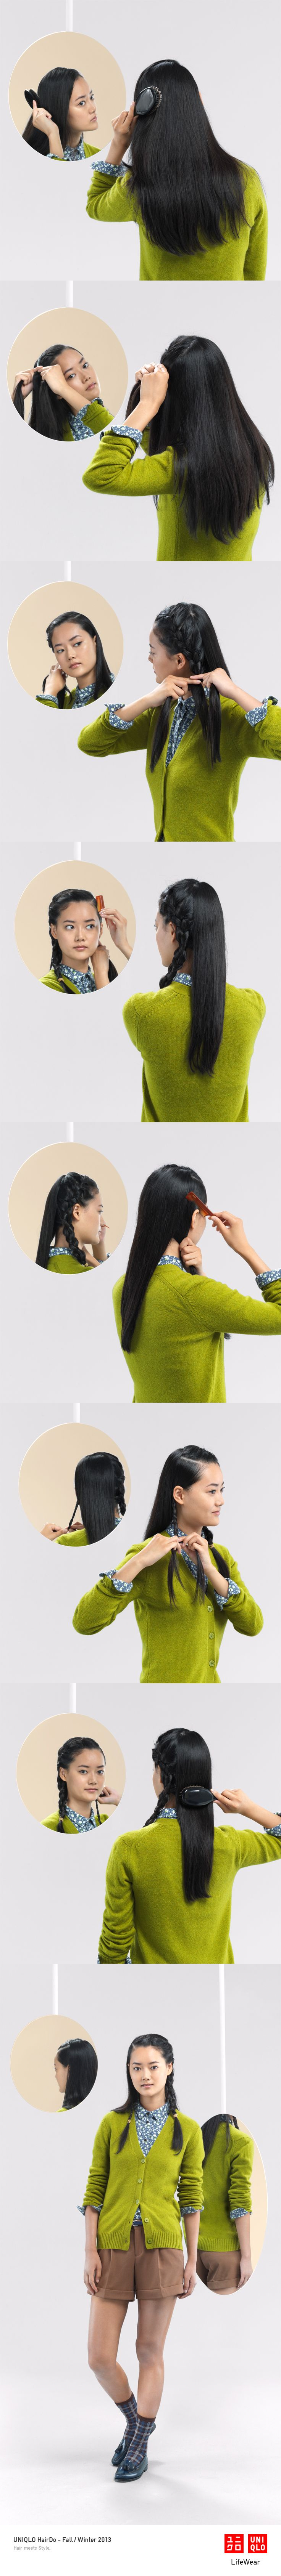 @UNIQLO 's HairDo board is just perfect! Check out all the looks and tutorials: http://www.pinterest.com/uniqlo/uniqlo-hairdo/